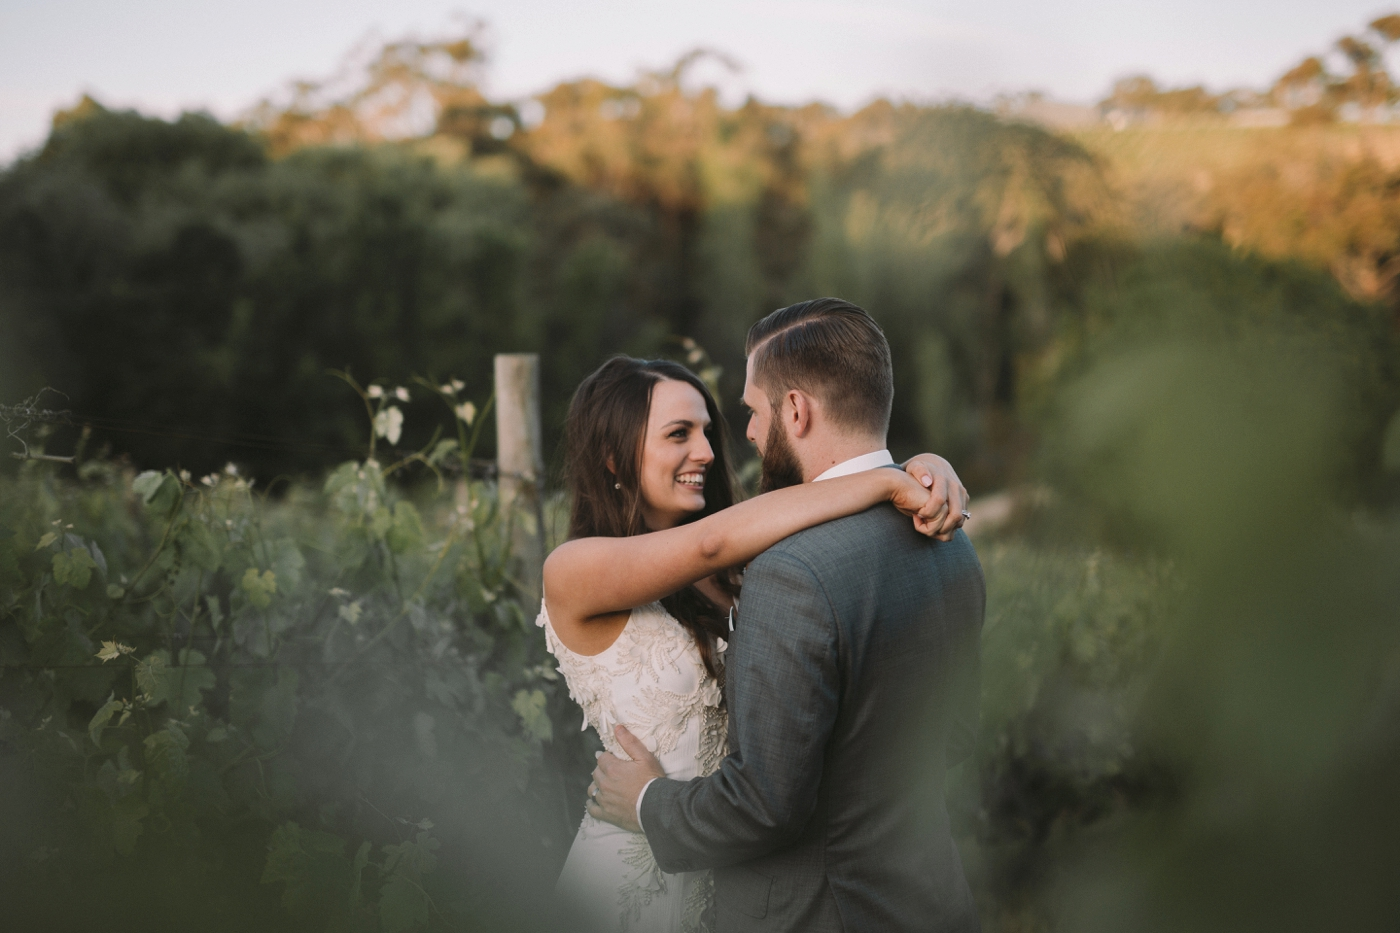 Maddy & Wes - K1 by Geoff Hardy Wedding - Adelaide Wedding Photographer - Natural wedding photography in Adelaide - Katherine Schultz_0068.jpg